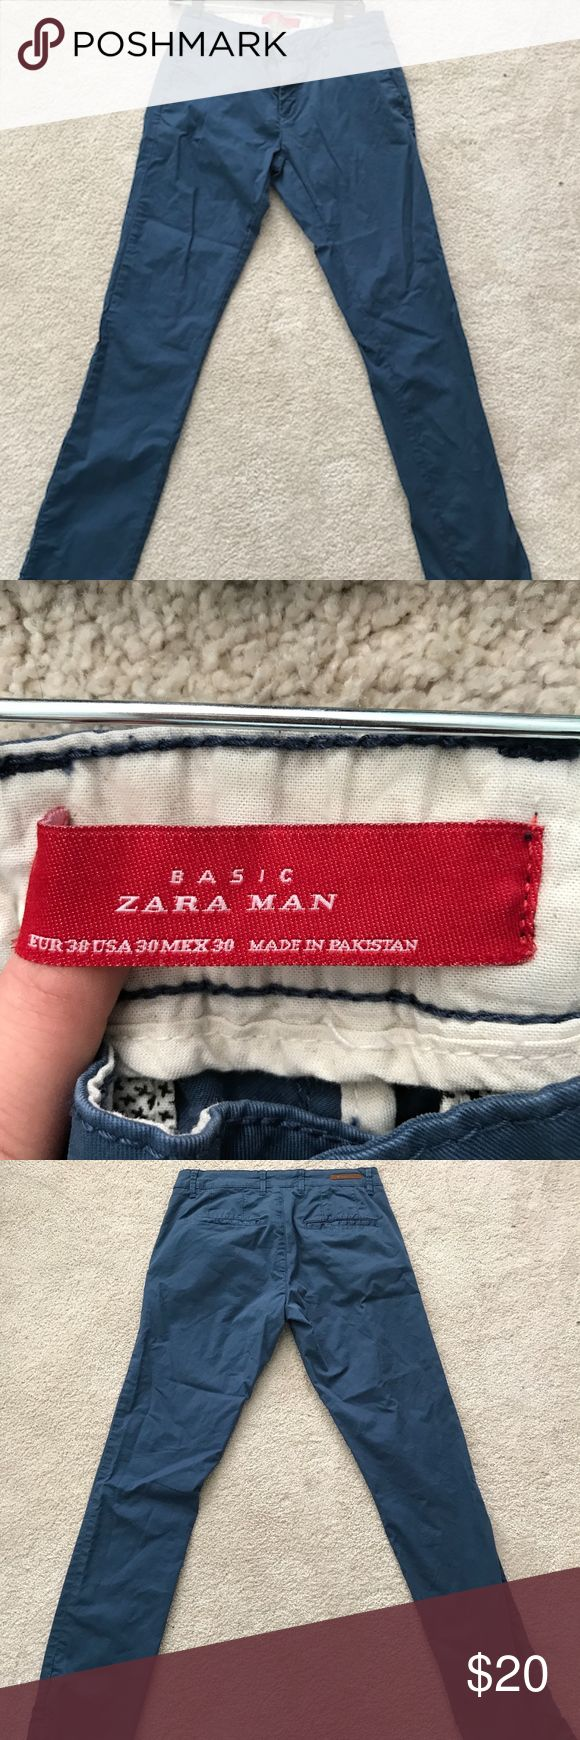 Zara Basic Men's Chino Khaki Pant Zara Man, Men's pant, Blue Khaki material, barely worn, No noticeable wear to the pant, back and front pockets Sizing: EUR 38, USA 30, MEX 30 Zara Pants Chinos & Khakis